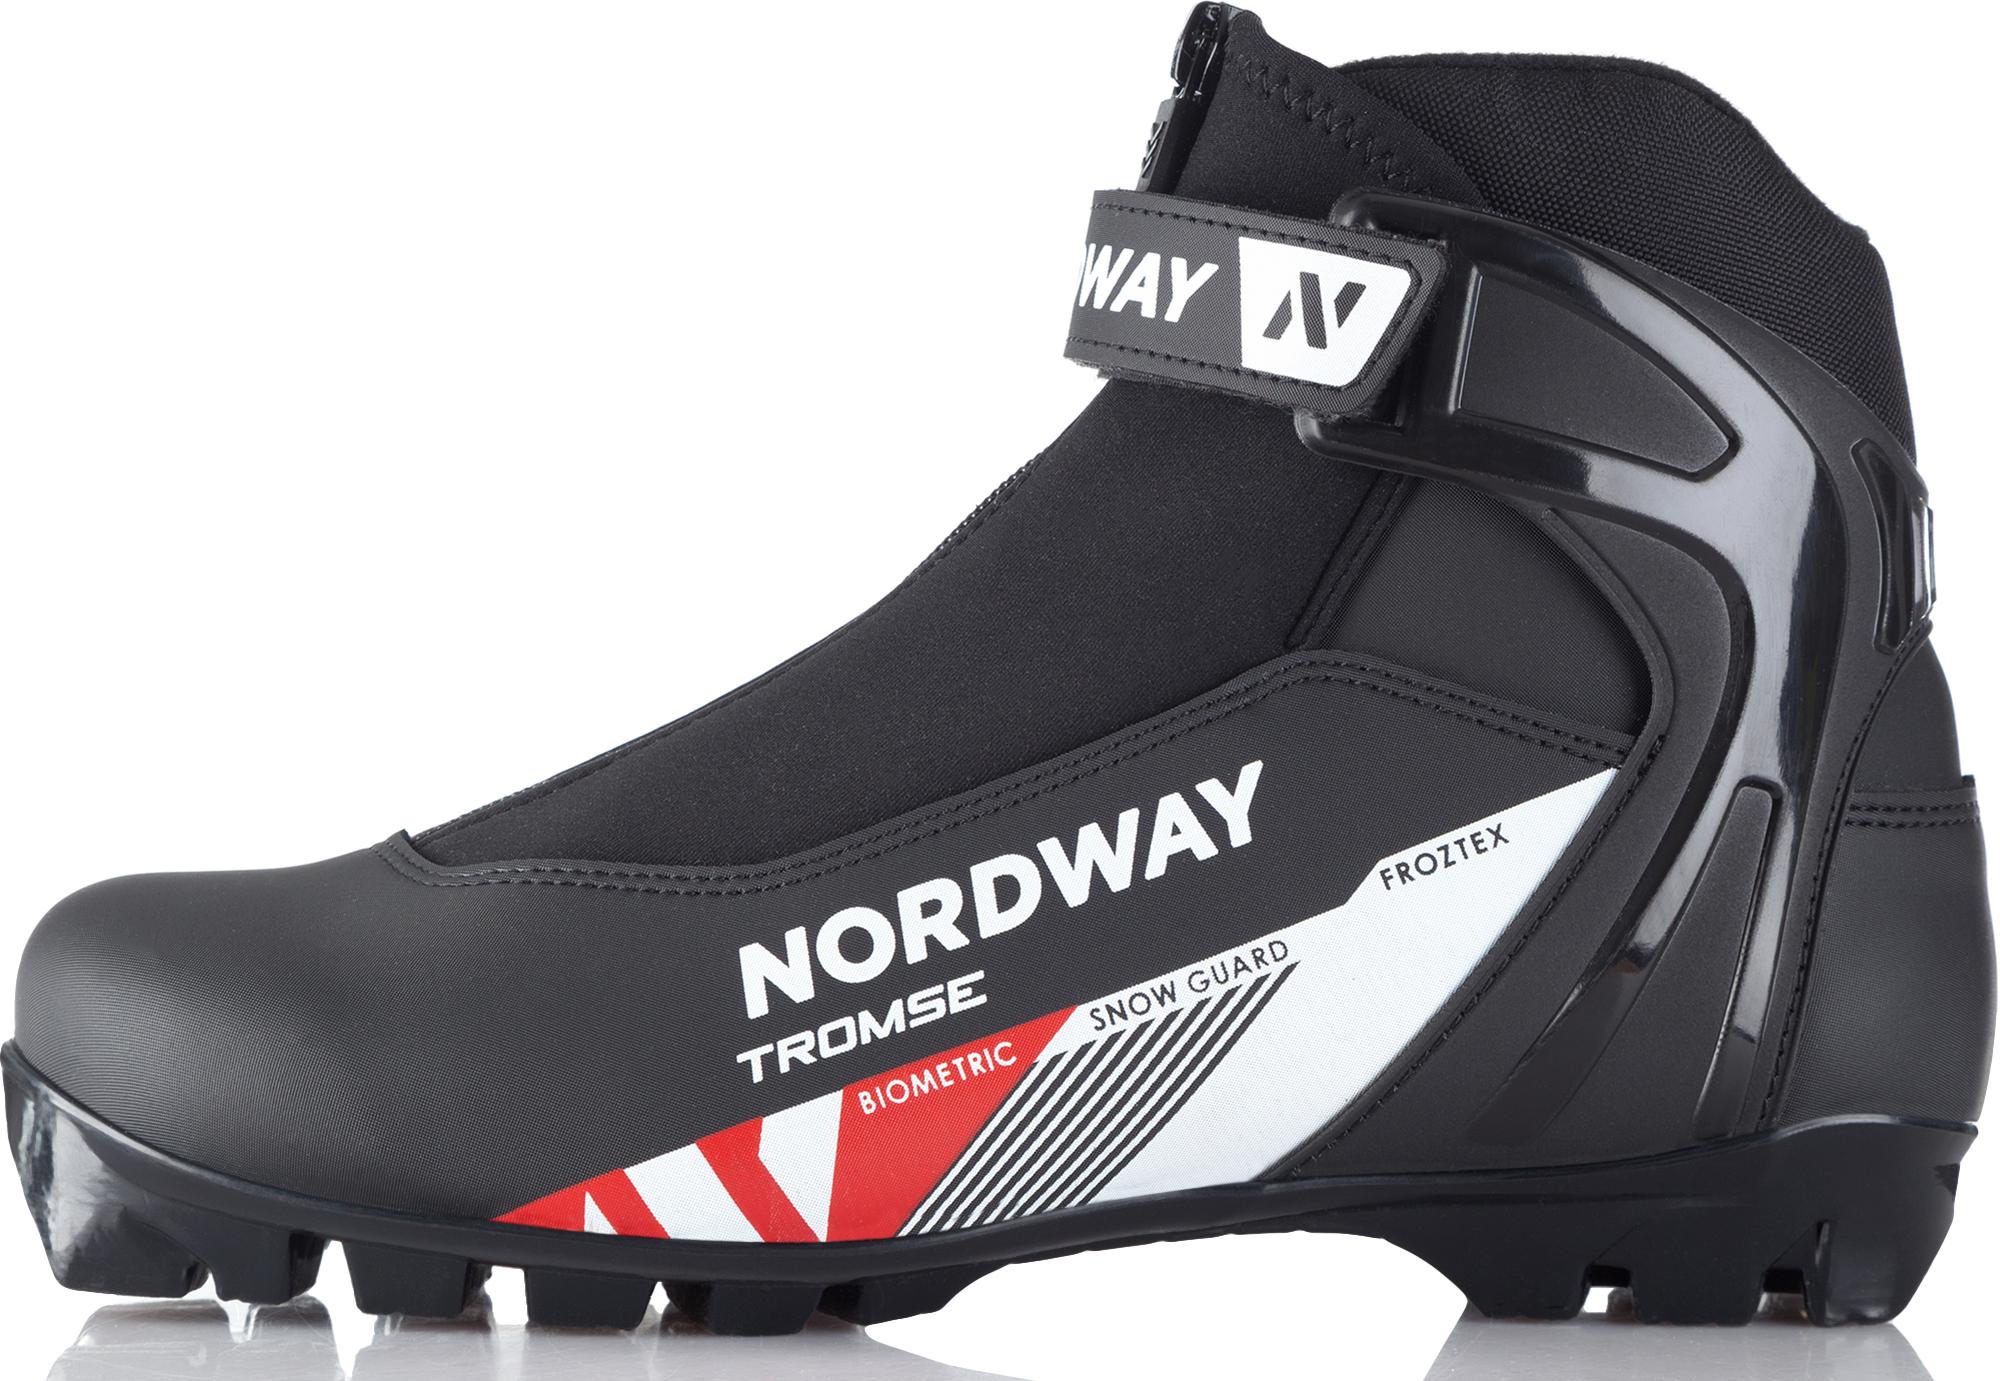 Nordway Ботинки для беговых лыж Nordway Tromse tv0668 digital dvb t tv receiver usb dongle w remote control antenna fm radio black